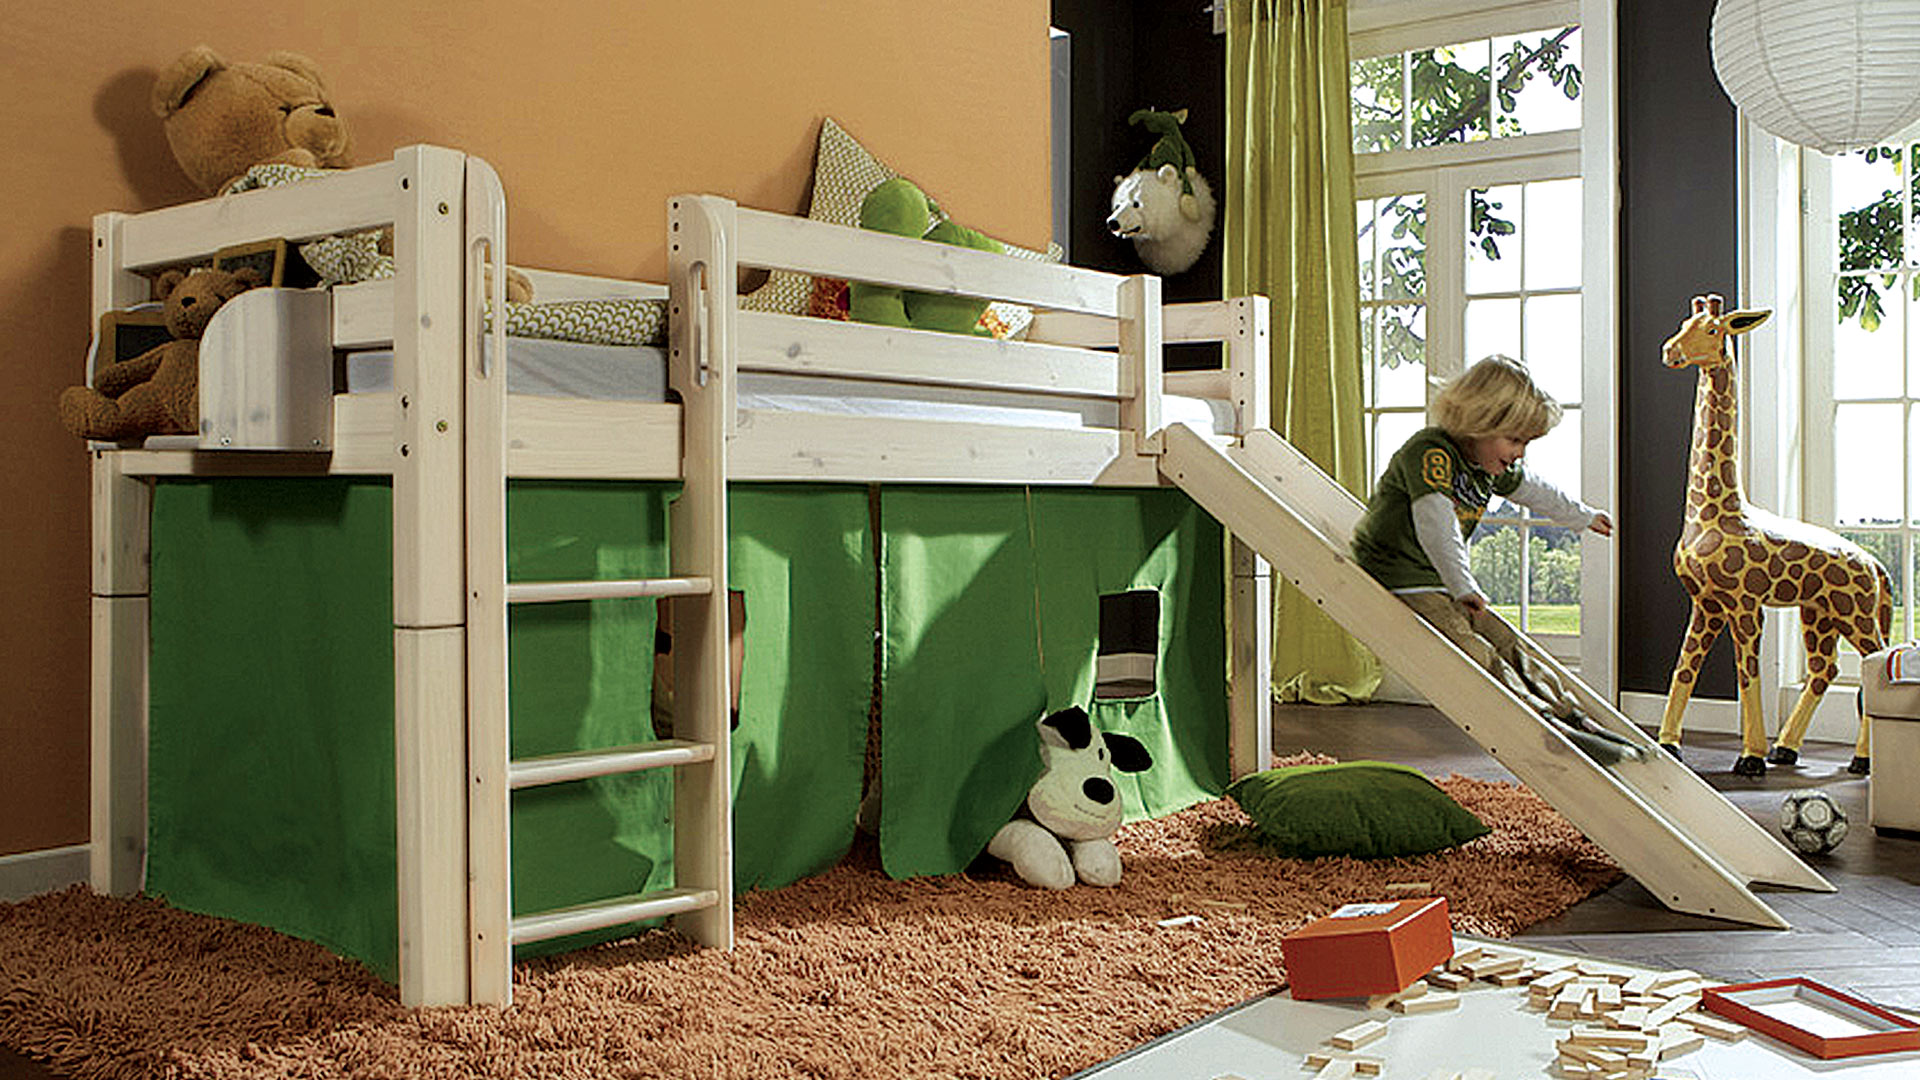 bett zum hochbett umbauen wohn design. Black Bedroom Furniture Sets. Home Design Ideas